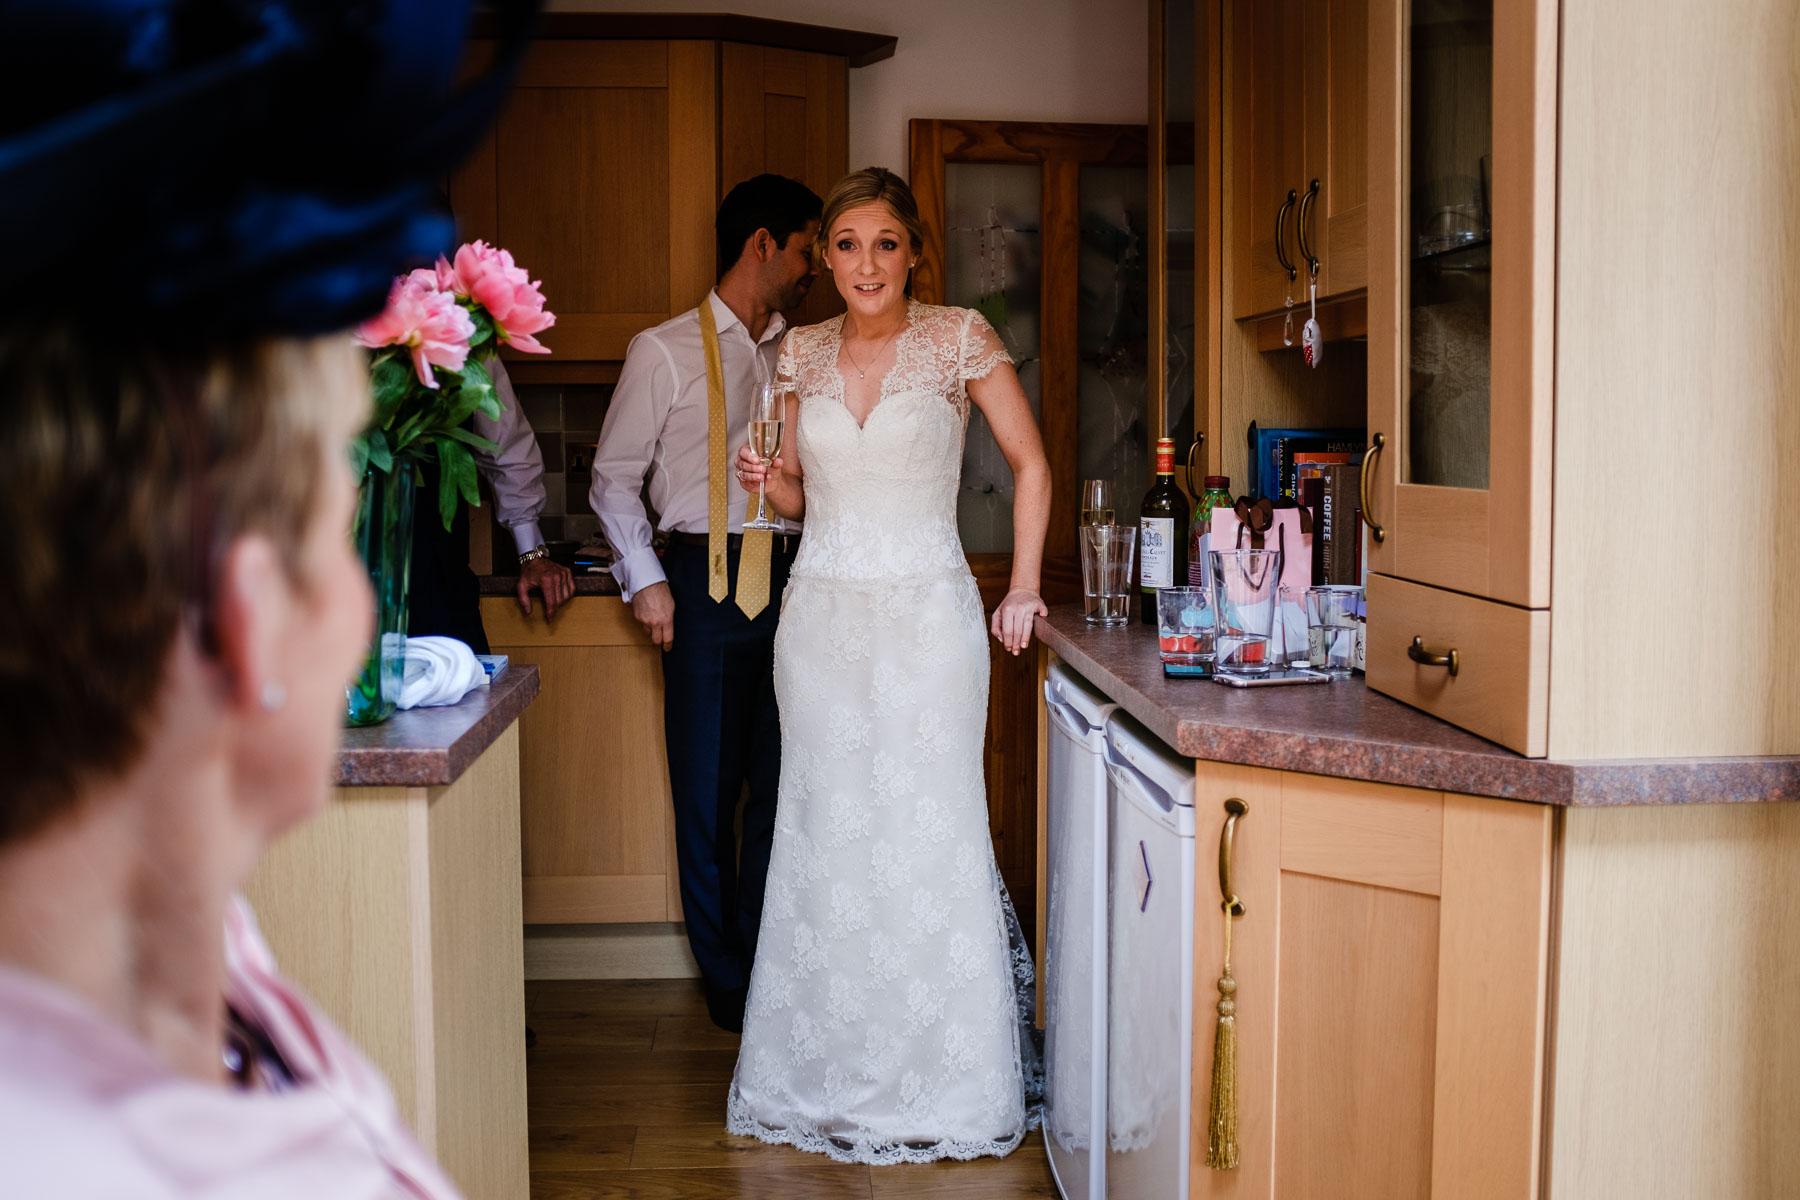 Crathorne Hall Wedding Photography - Jo & Paul (32).jpg